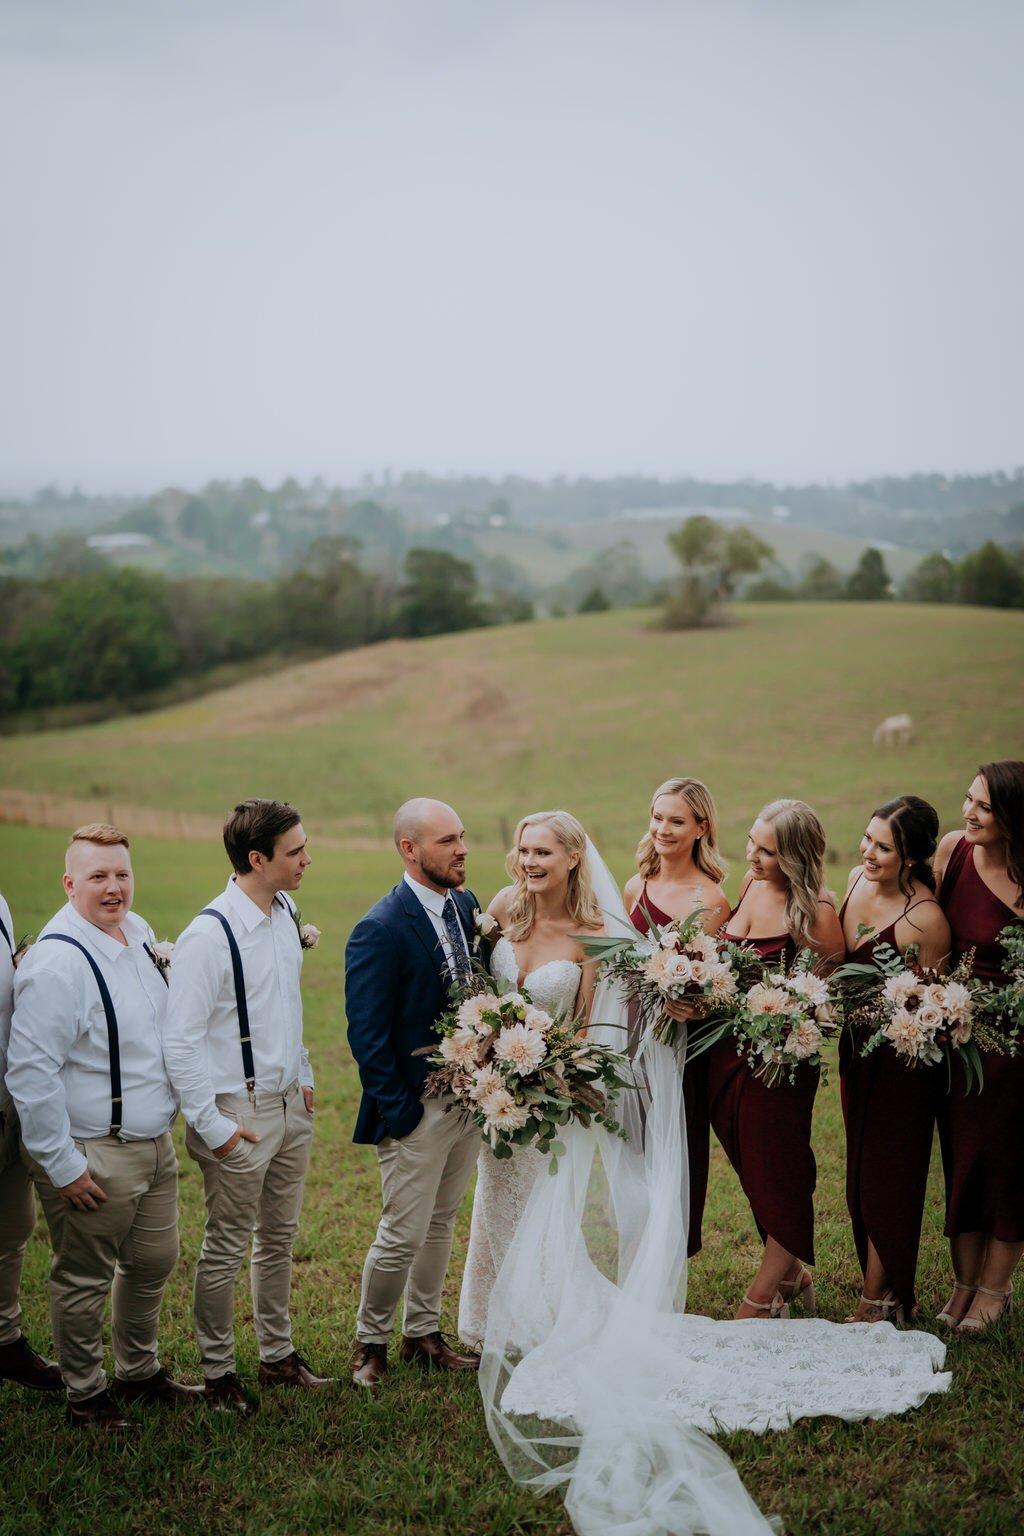 ava-me-photography-jade-simon-loxley-bellbird-hill-kurrajong-heights-wedding-619